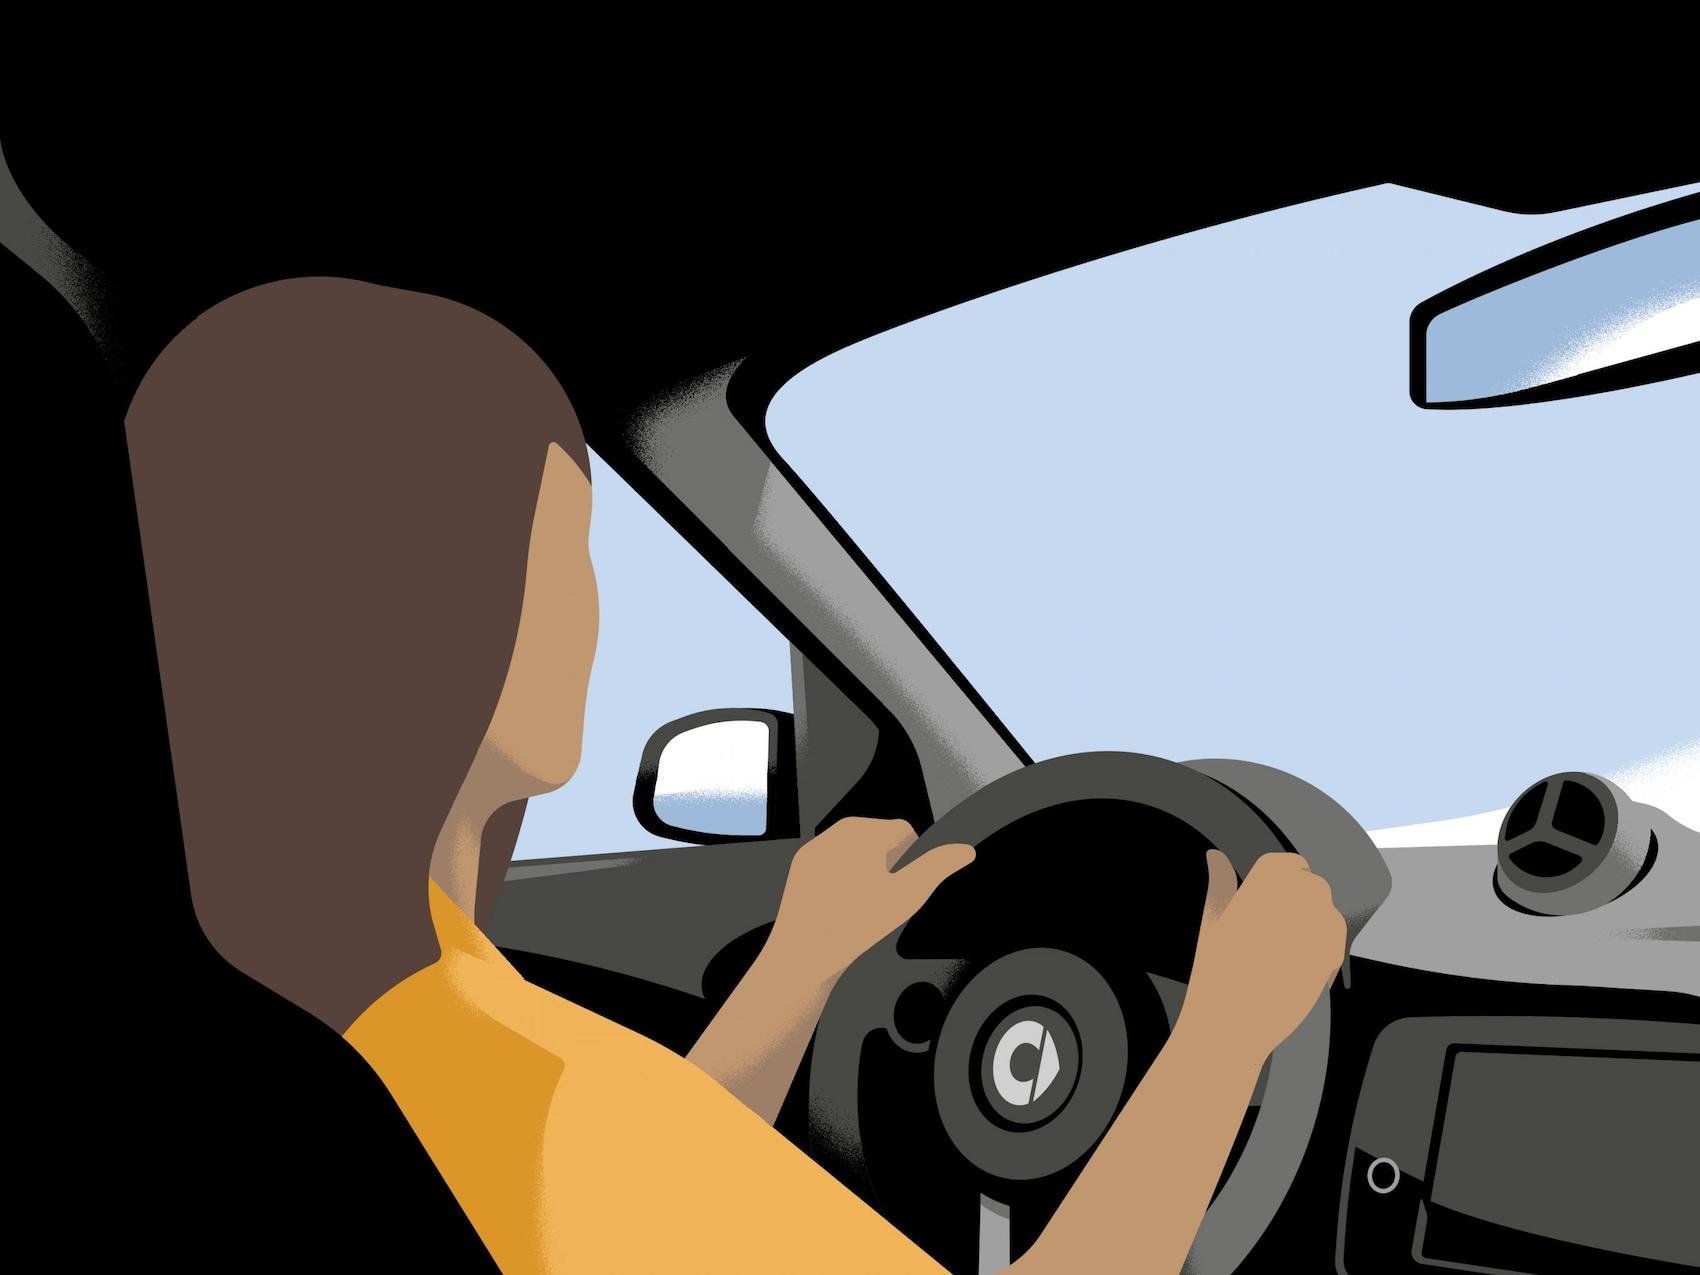 Ženska sedi za volanom svojega vozila smart EQ fortwo.